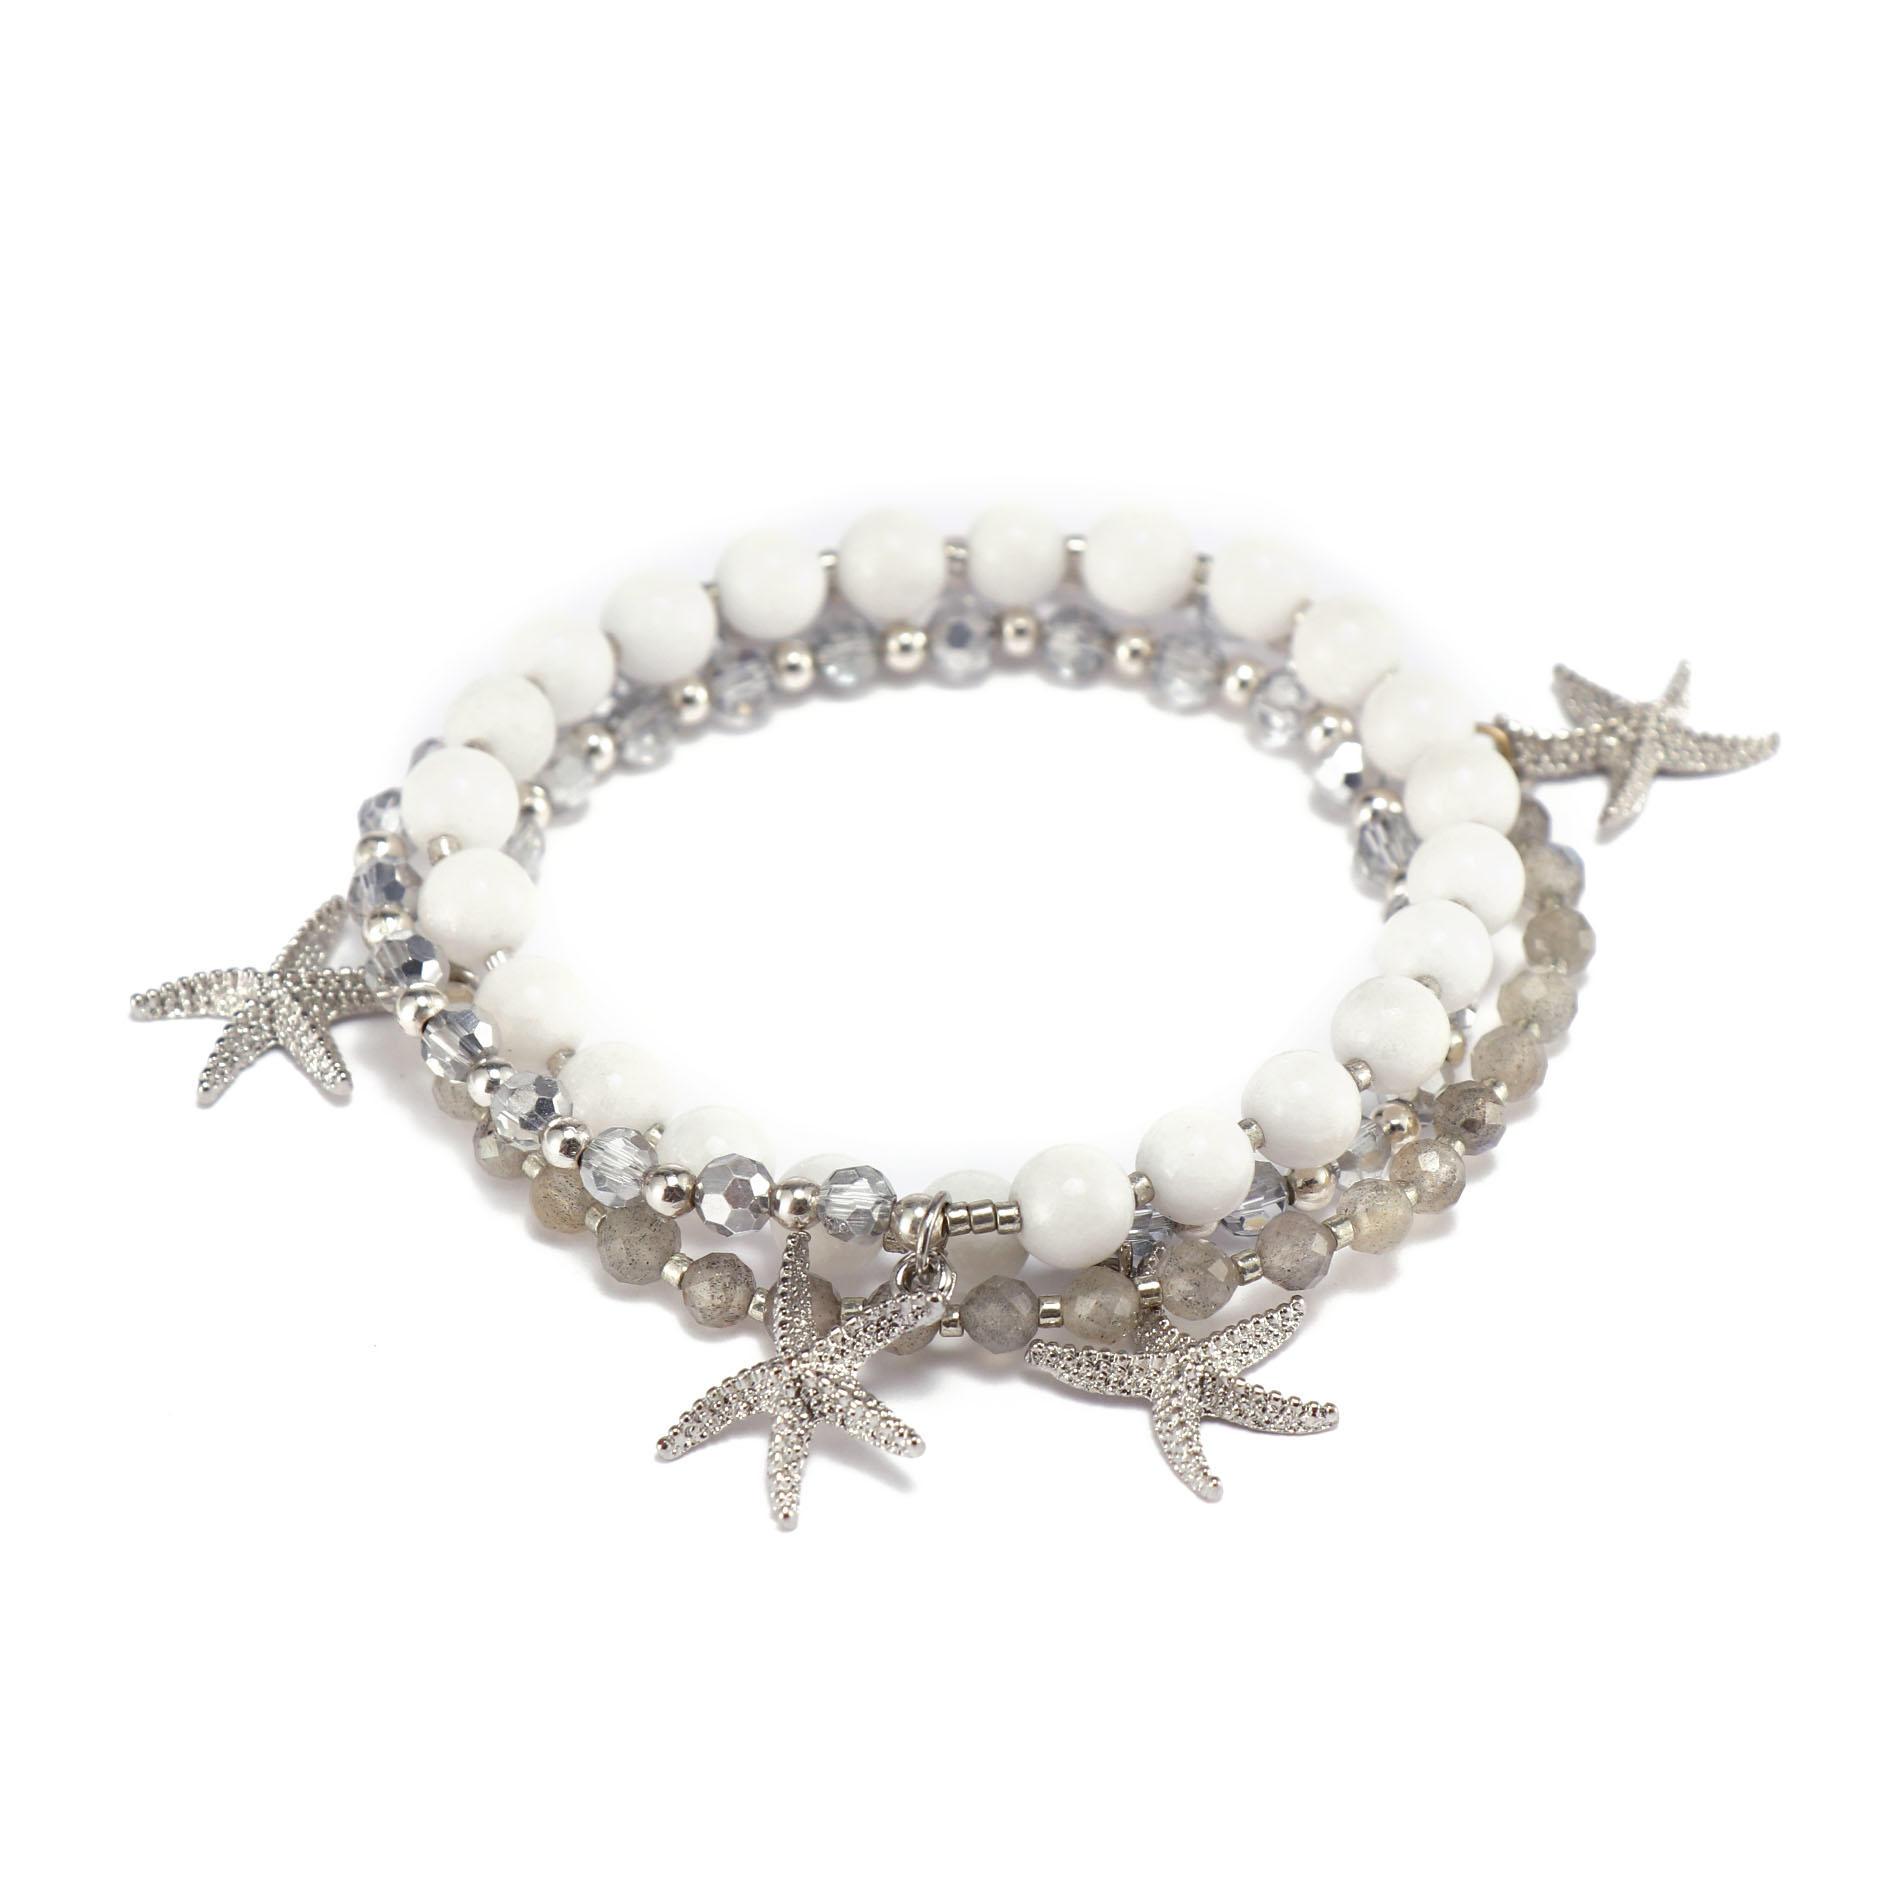 Handmade Mutilayer Stone And Miyuki Bracelet With Crystal Beads